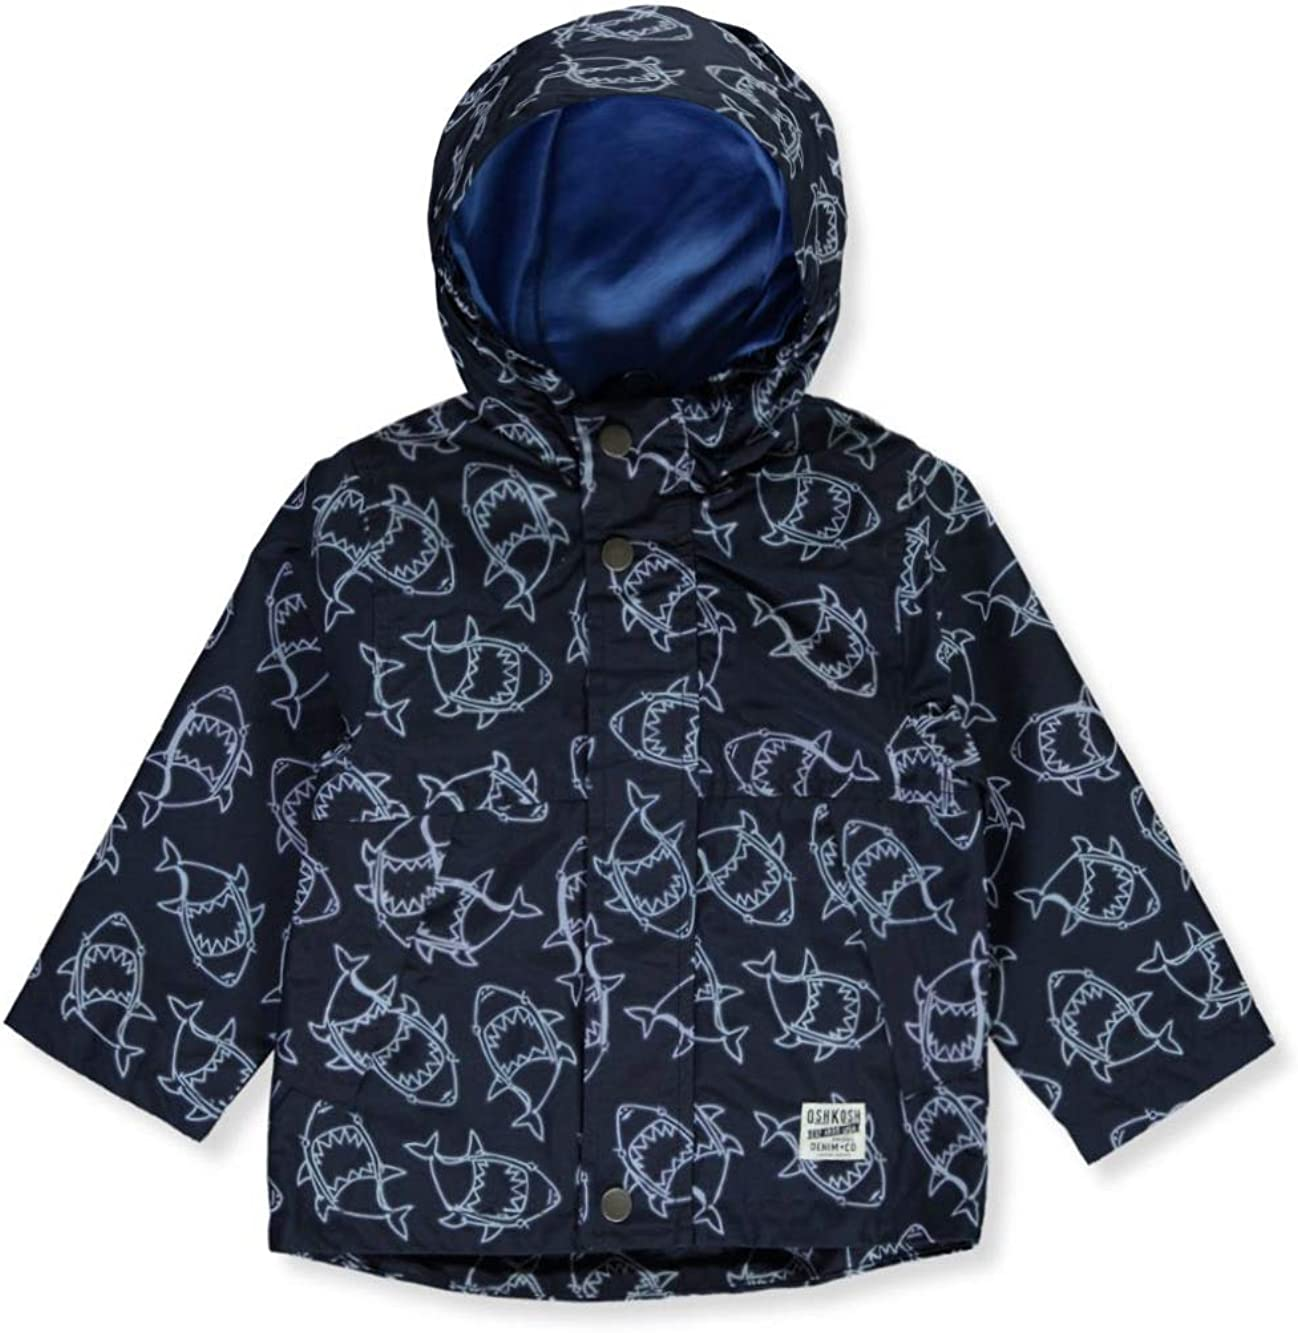 OshKosh Baby Boys Shark Windbreaker Jacket